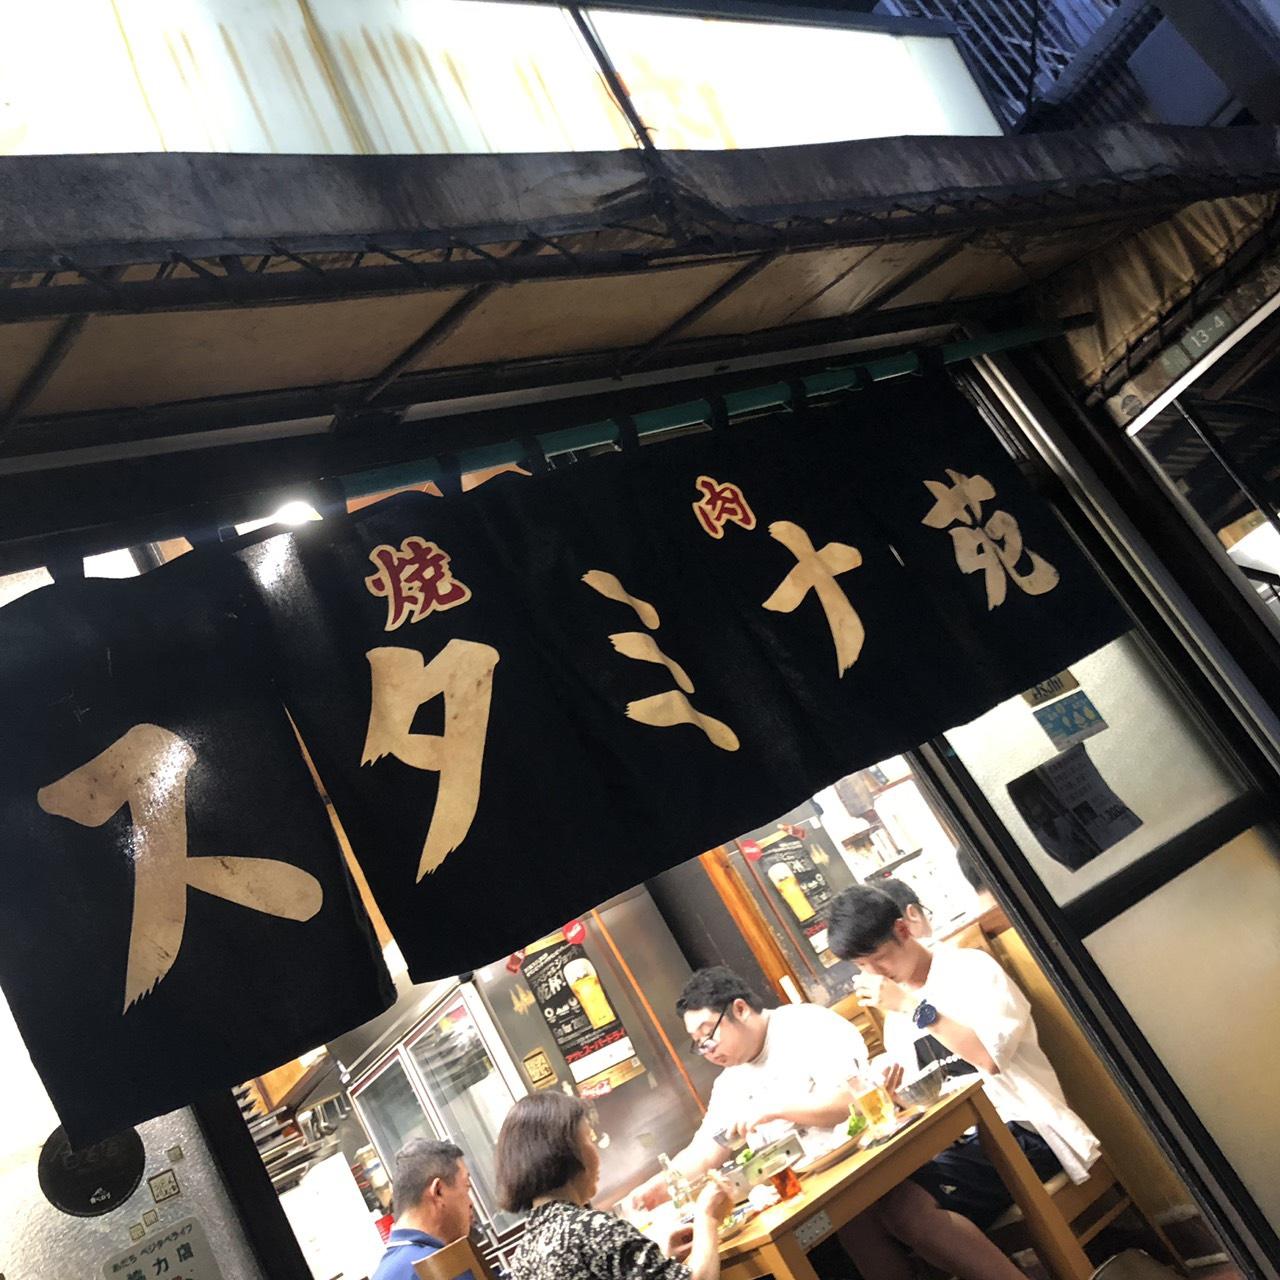 img 2419 1 - 仙台と東京の「予約」の違い